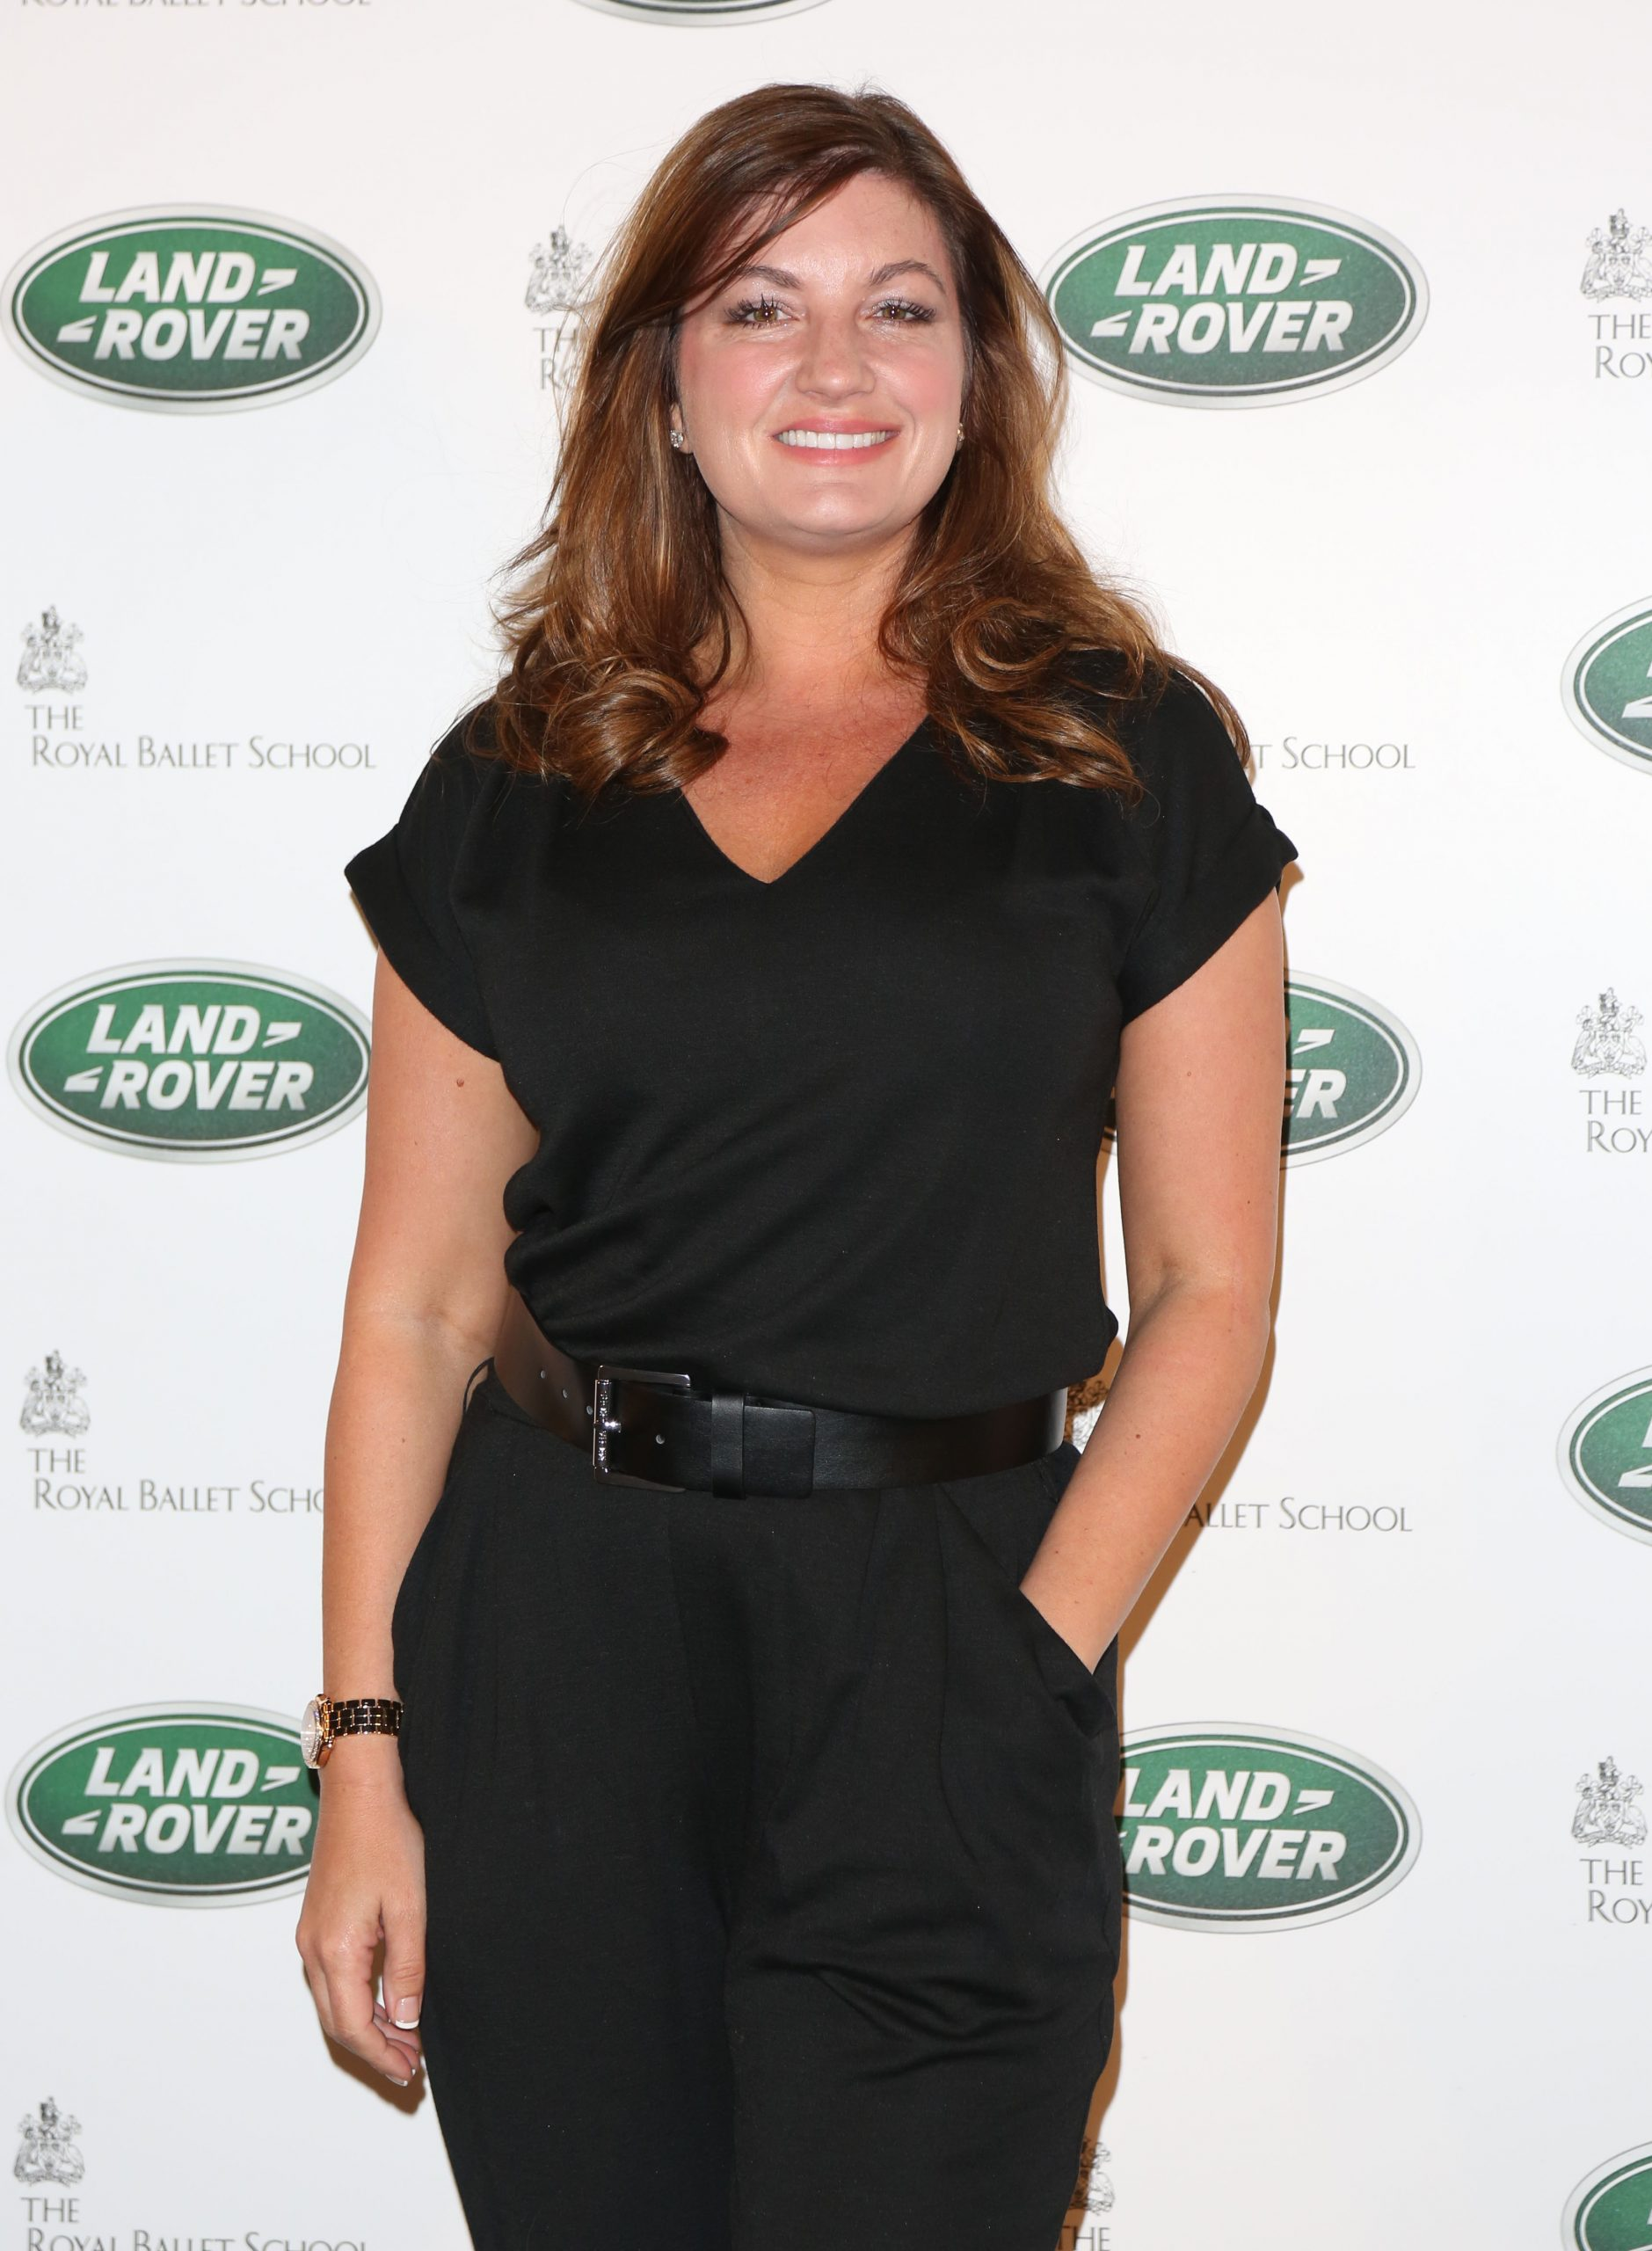 Baroness Karren Brady